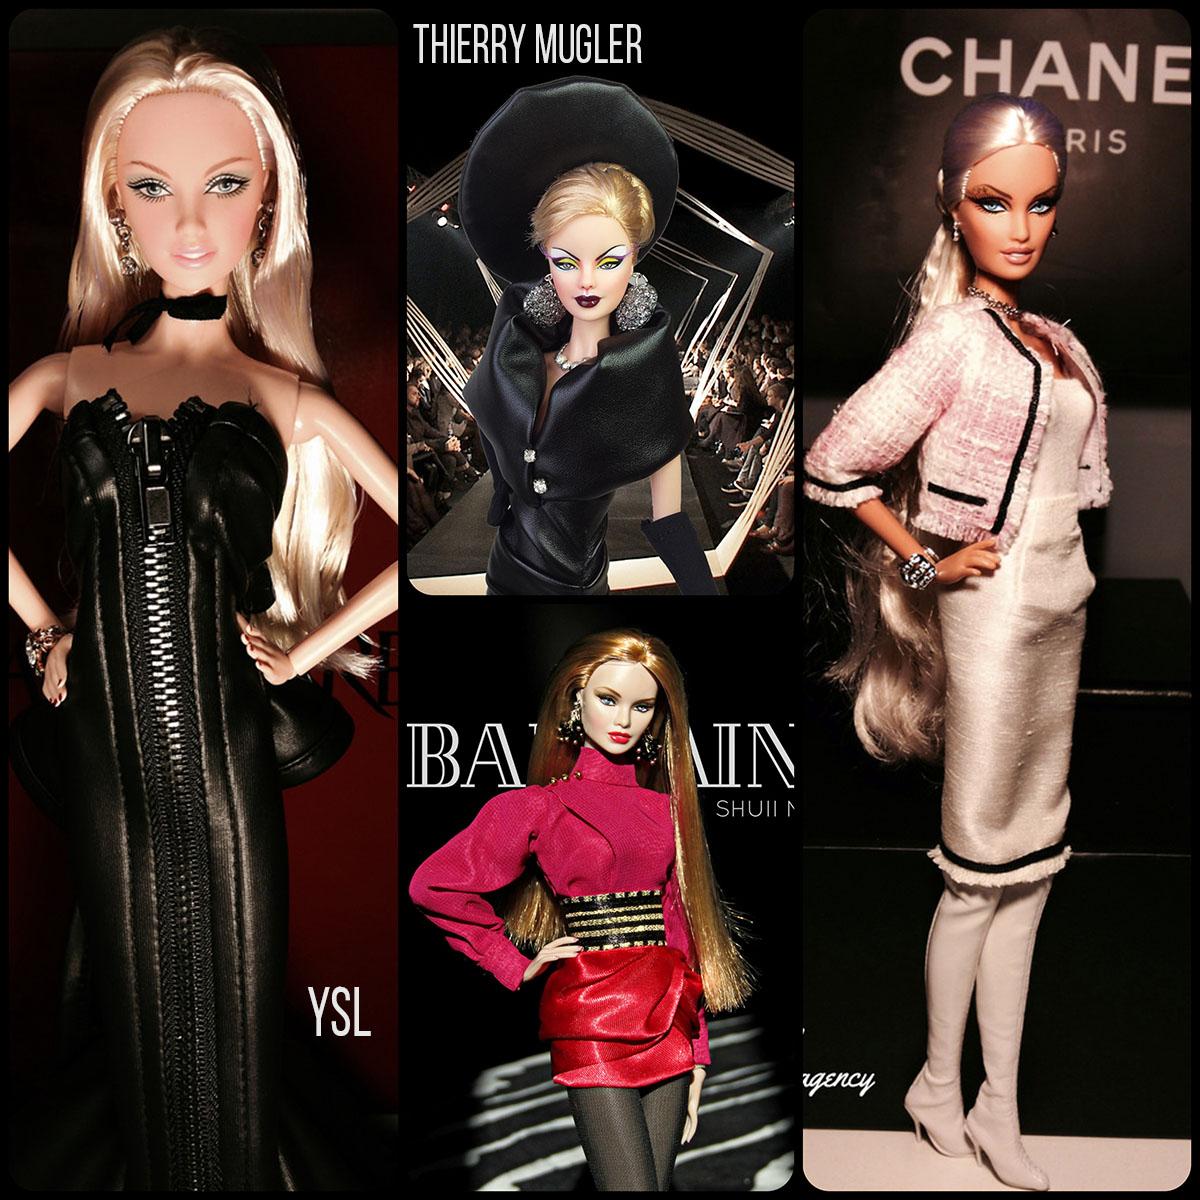 Barbie-Runway-Magazine-Thierry-Mugler-Chanel-Balmain-YSL